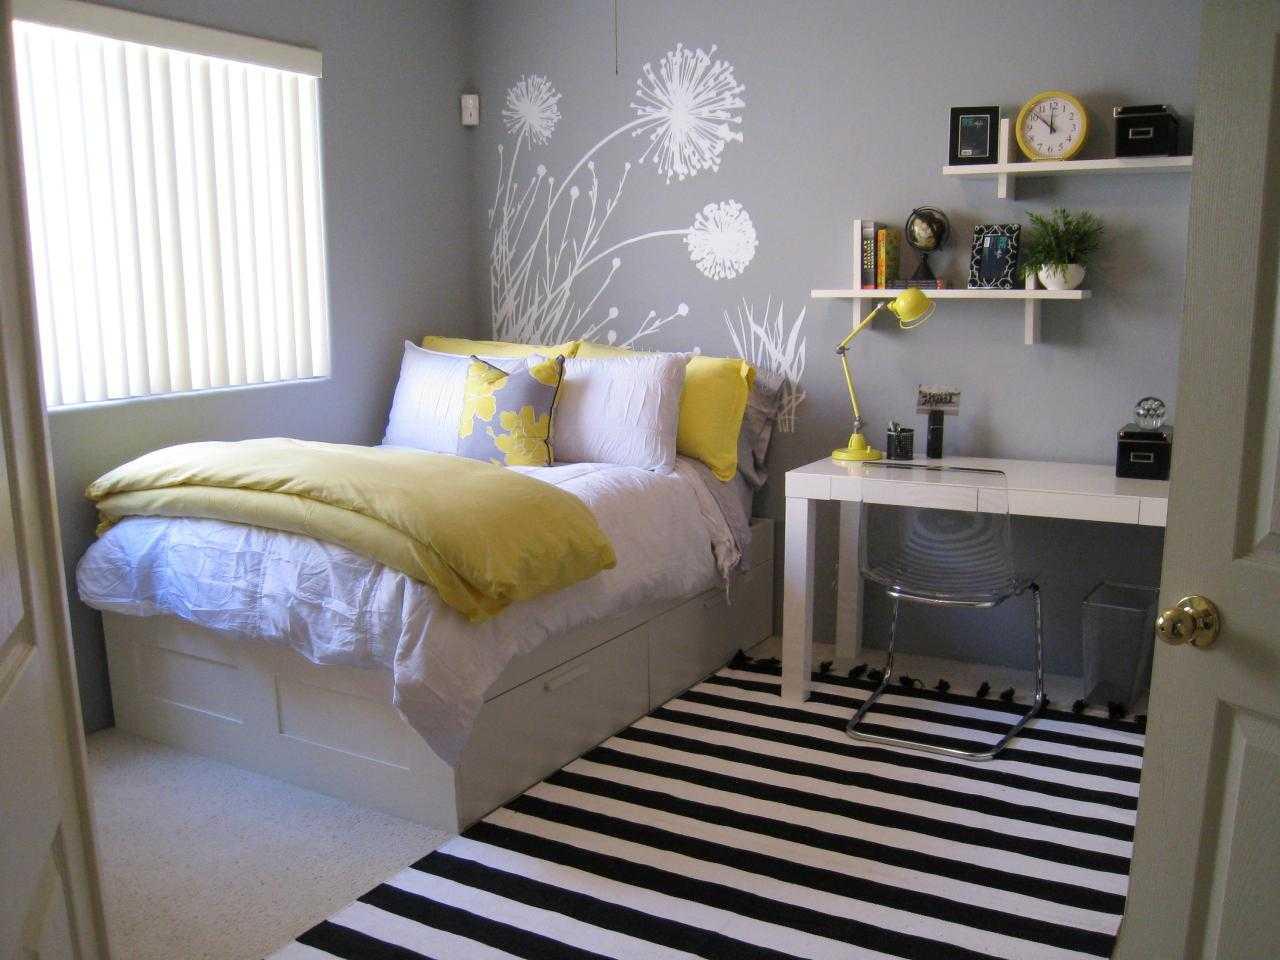 25 dise os que har n inspirarte para decorar tu habitaci n for Decoracion para pared de cuarto